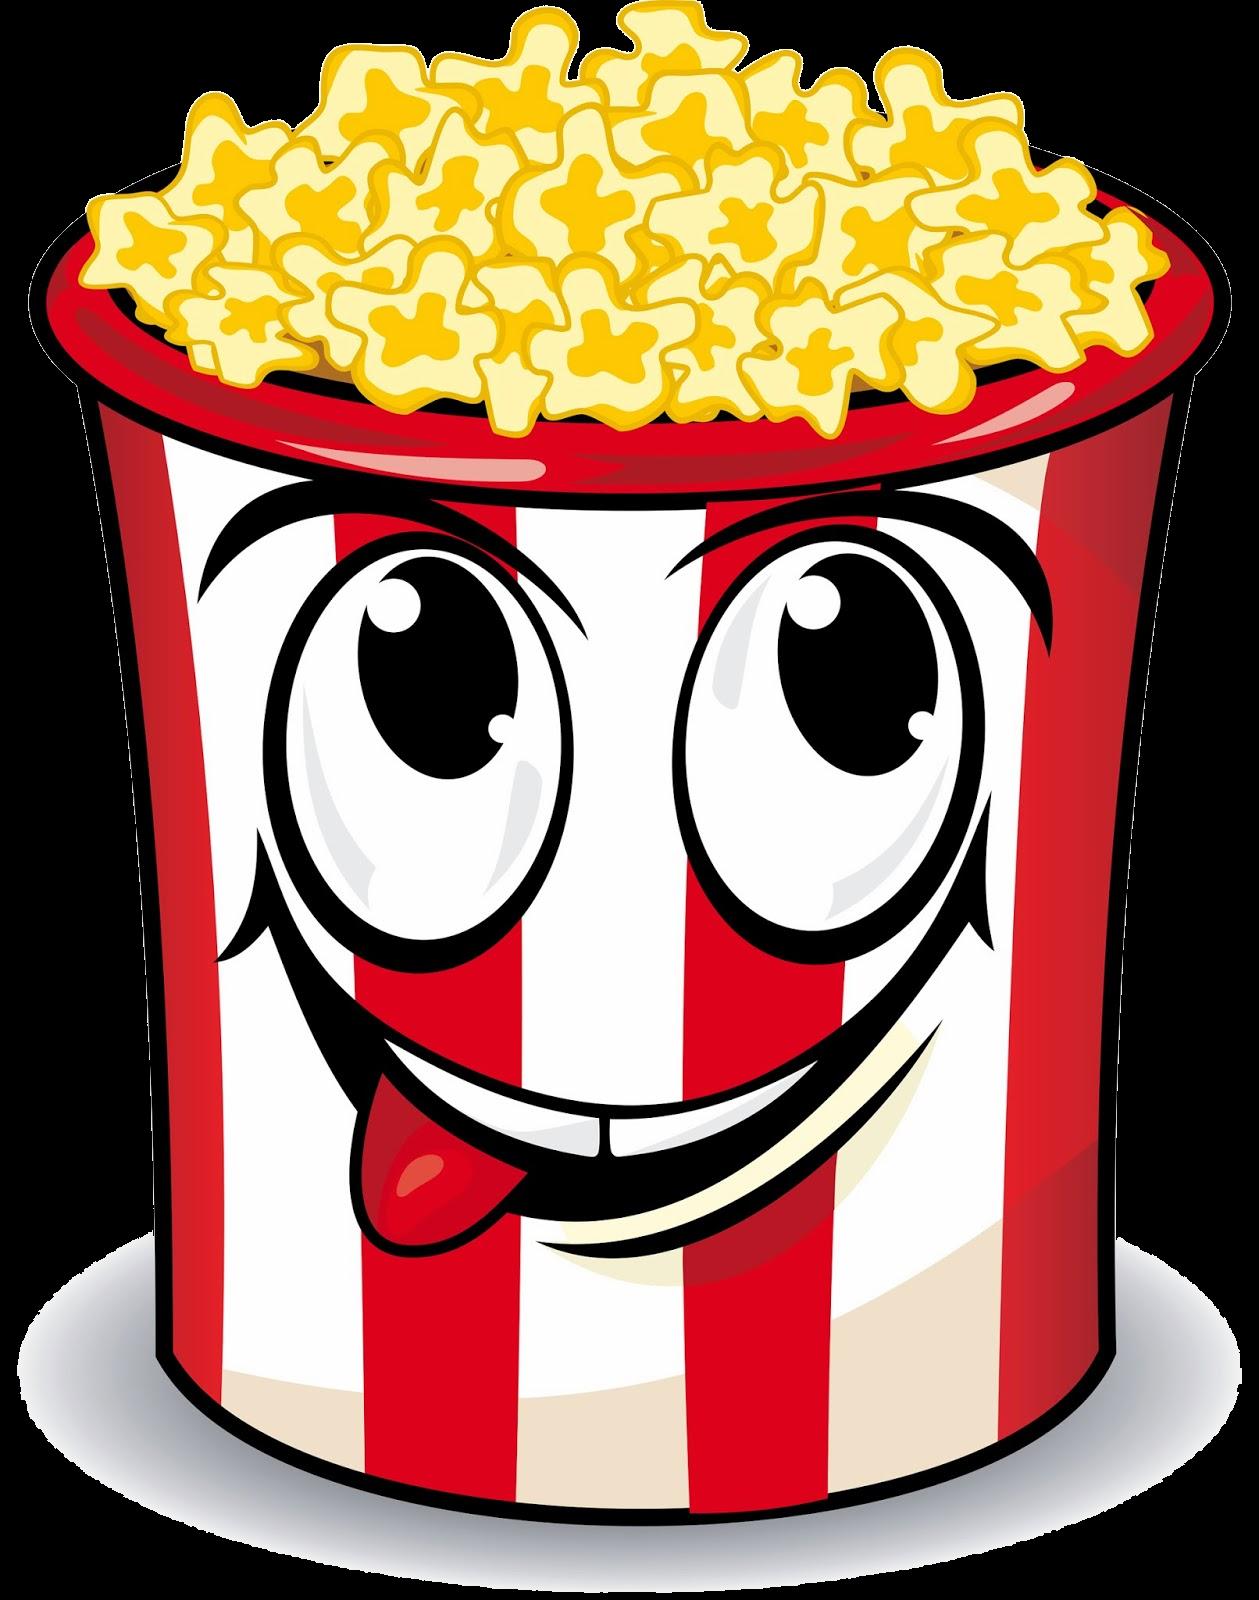 Popcorn Clipart Free Clip Art Images Image Transparent Png.